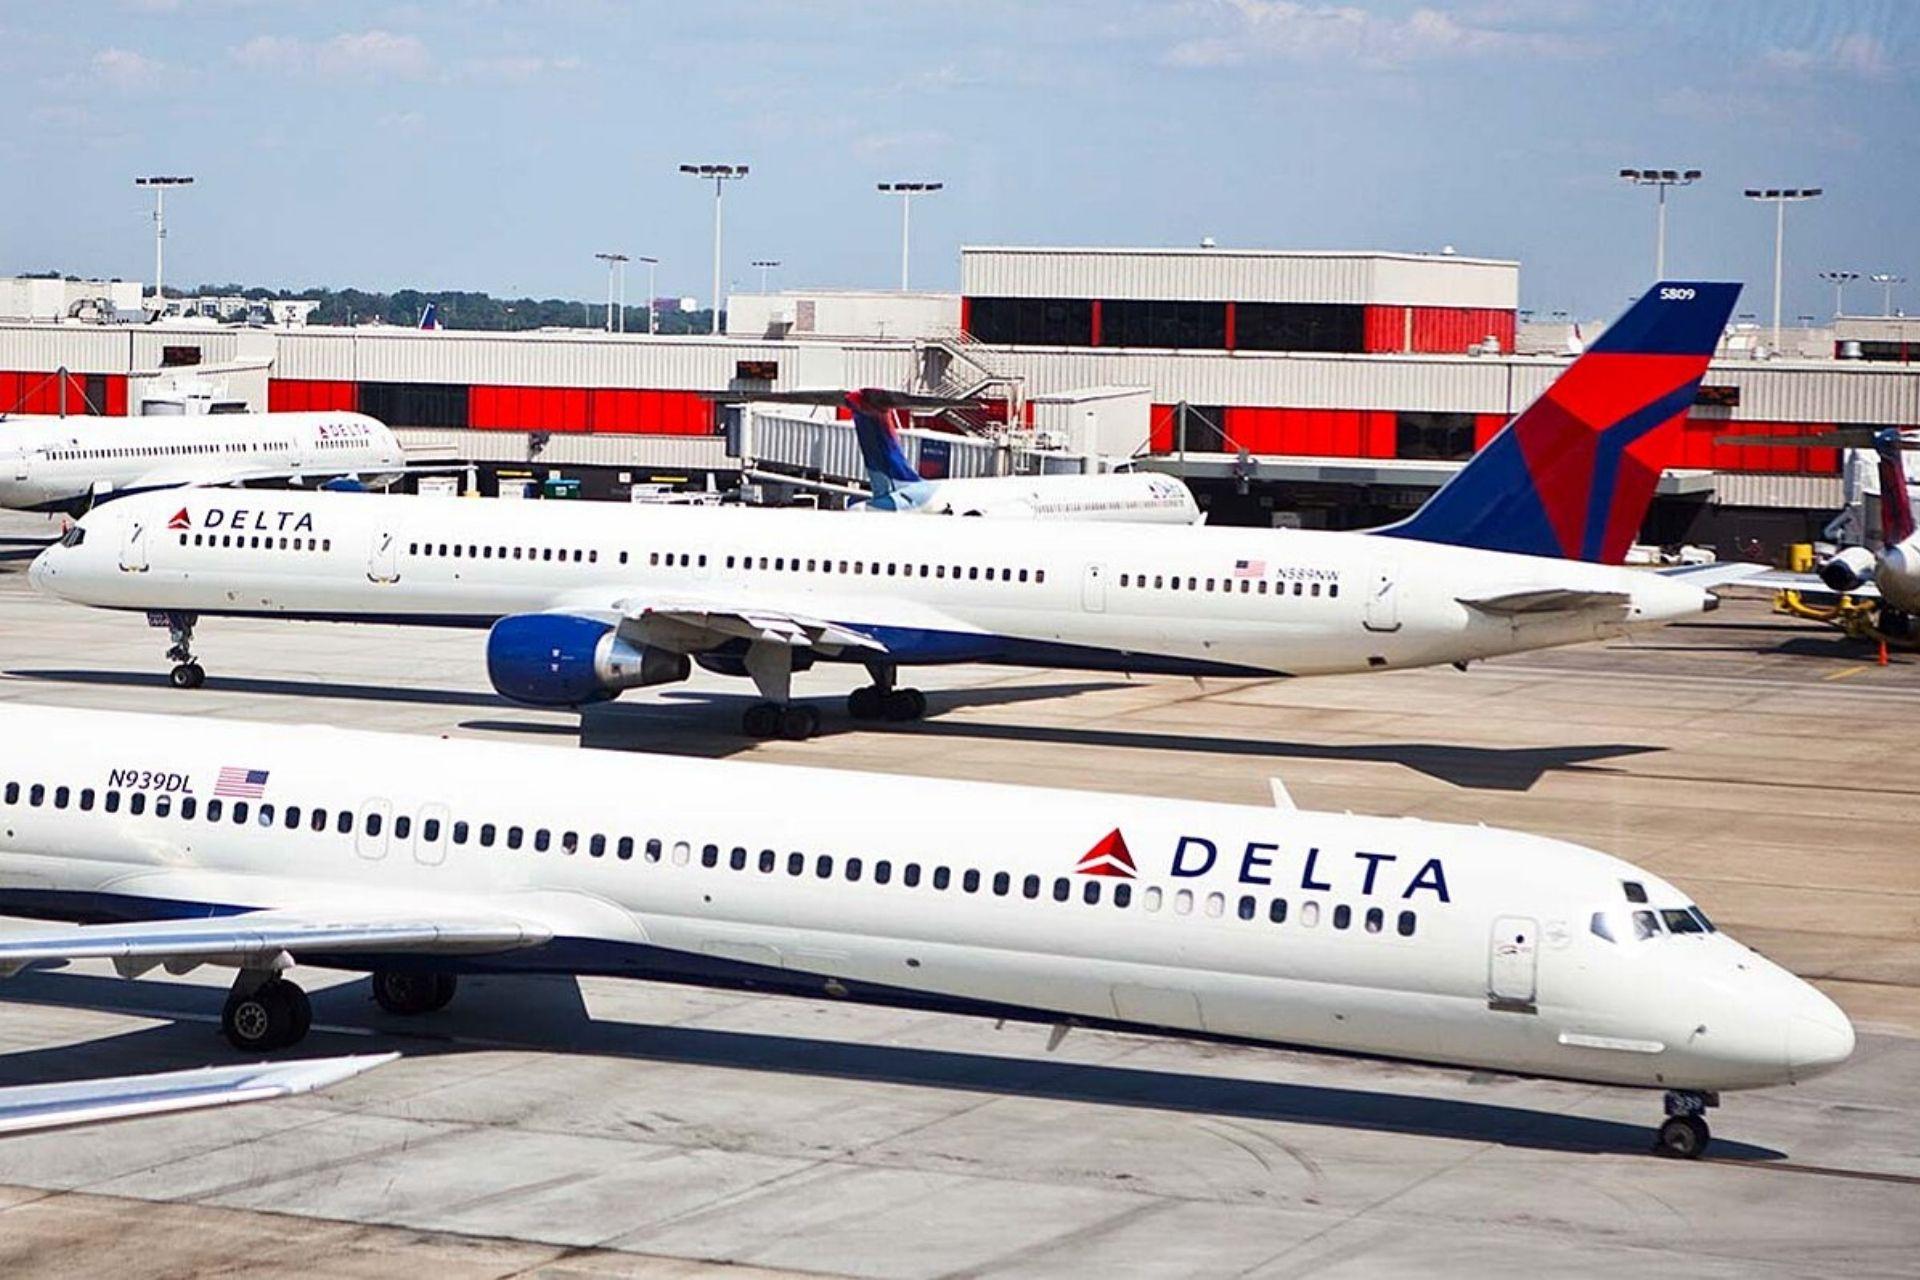 Delta Airlines planes